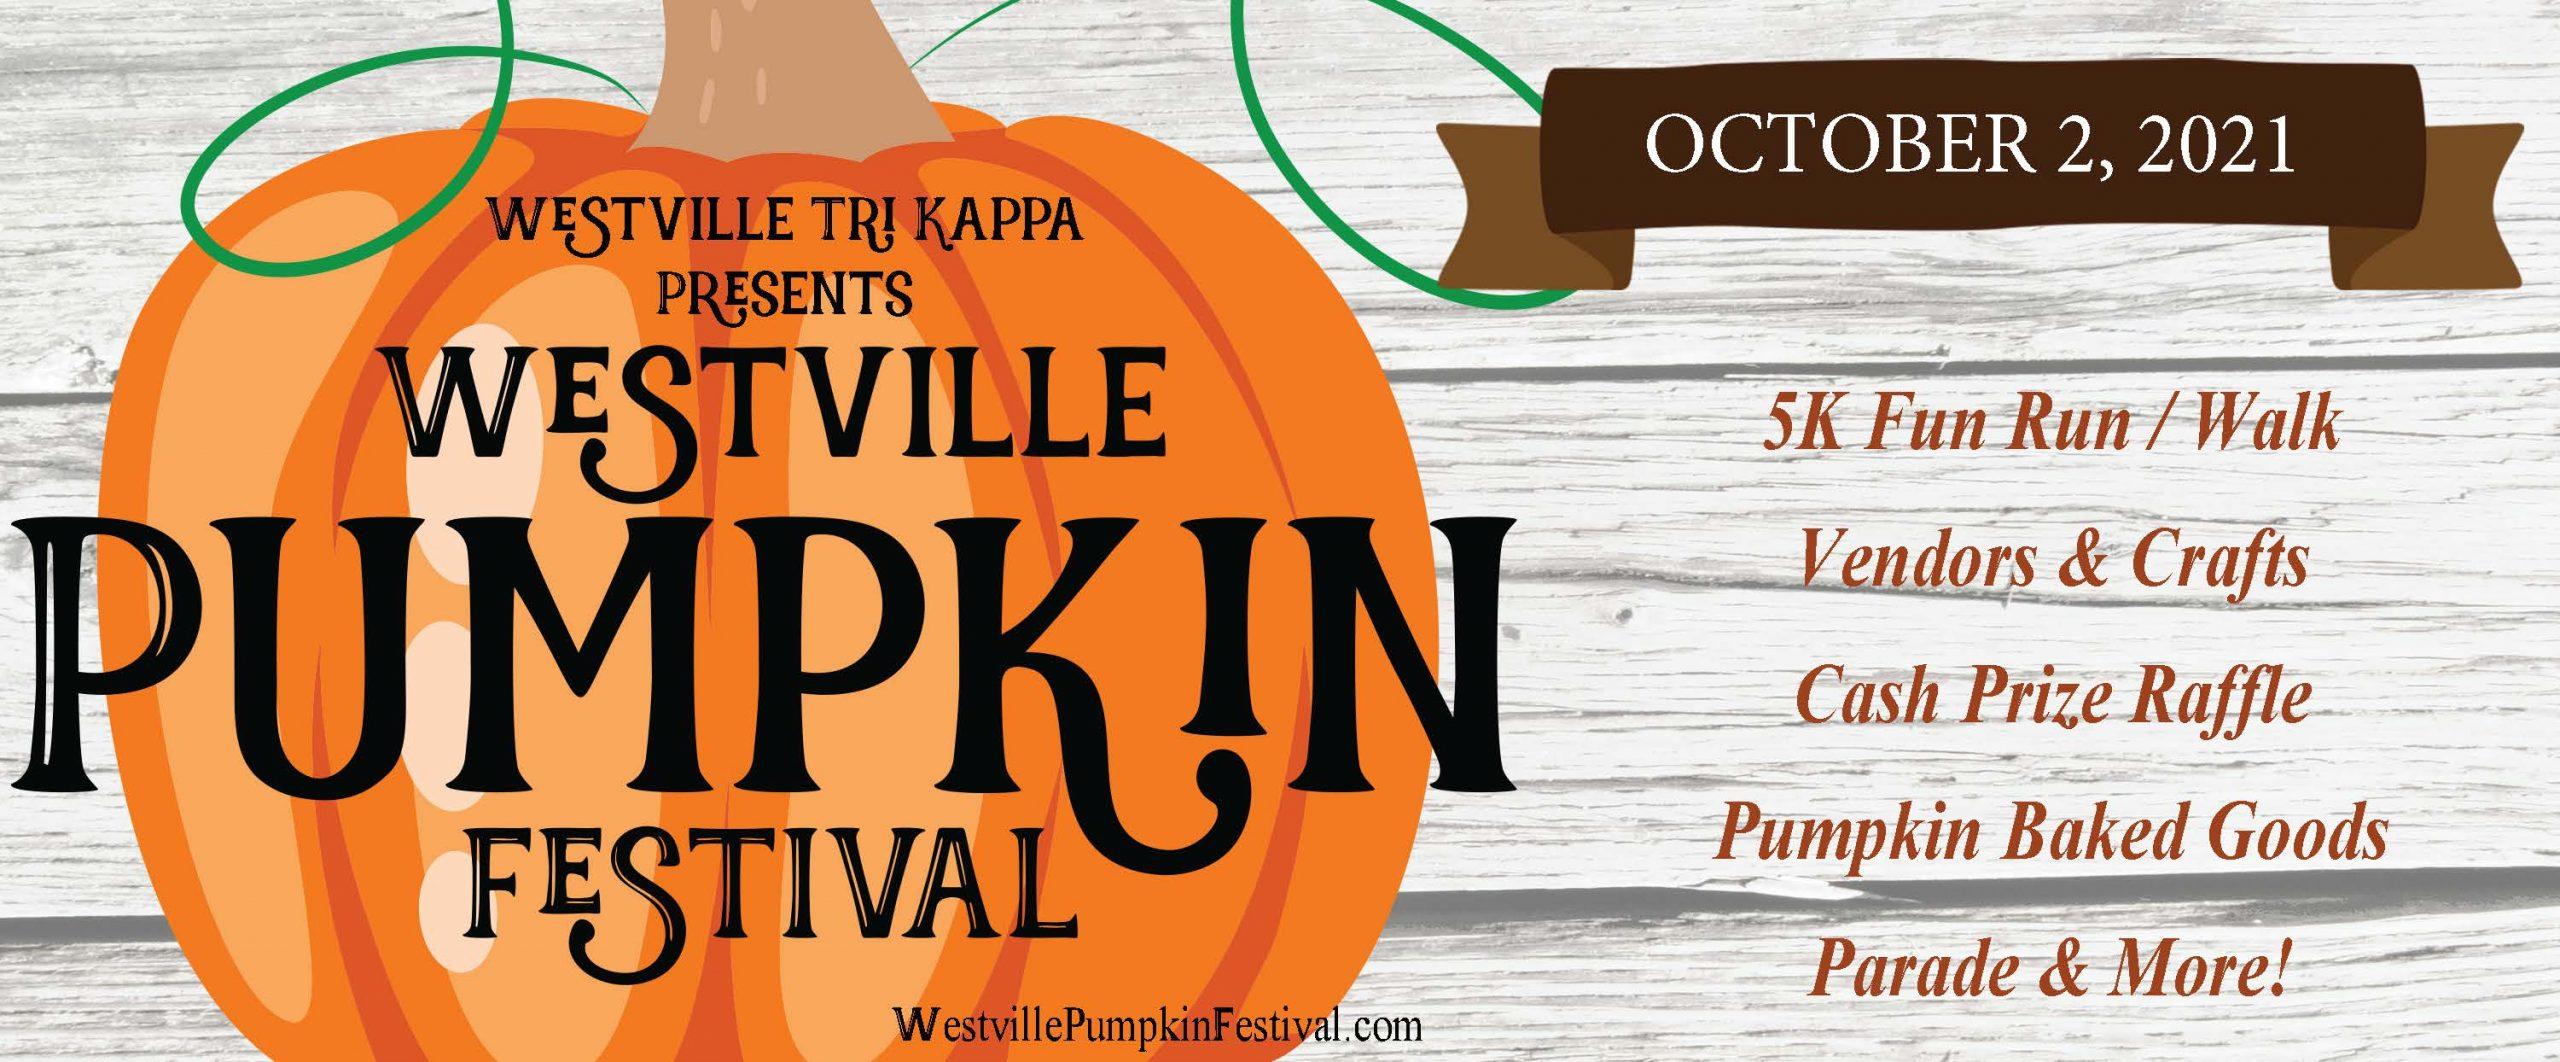 westville pumpkin festival 2021 scaled